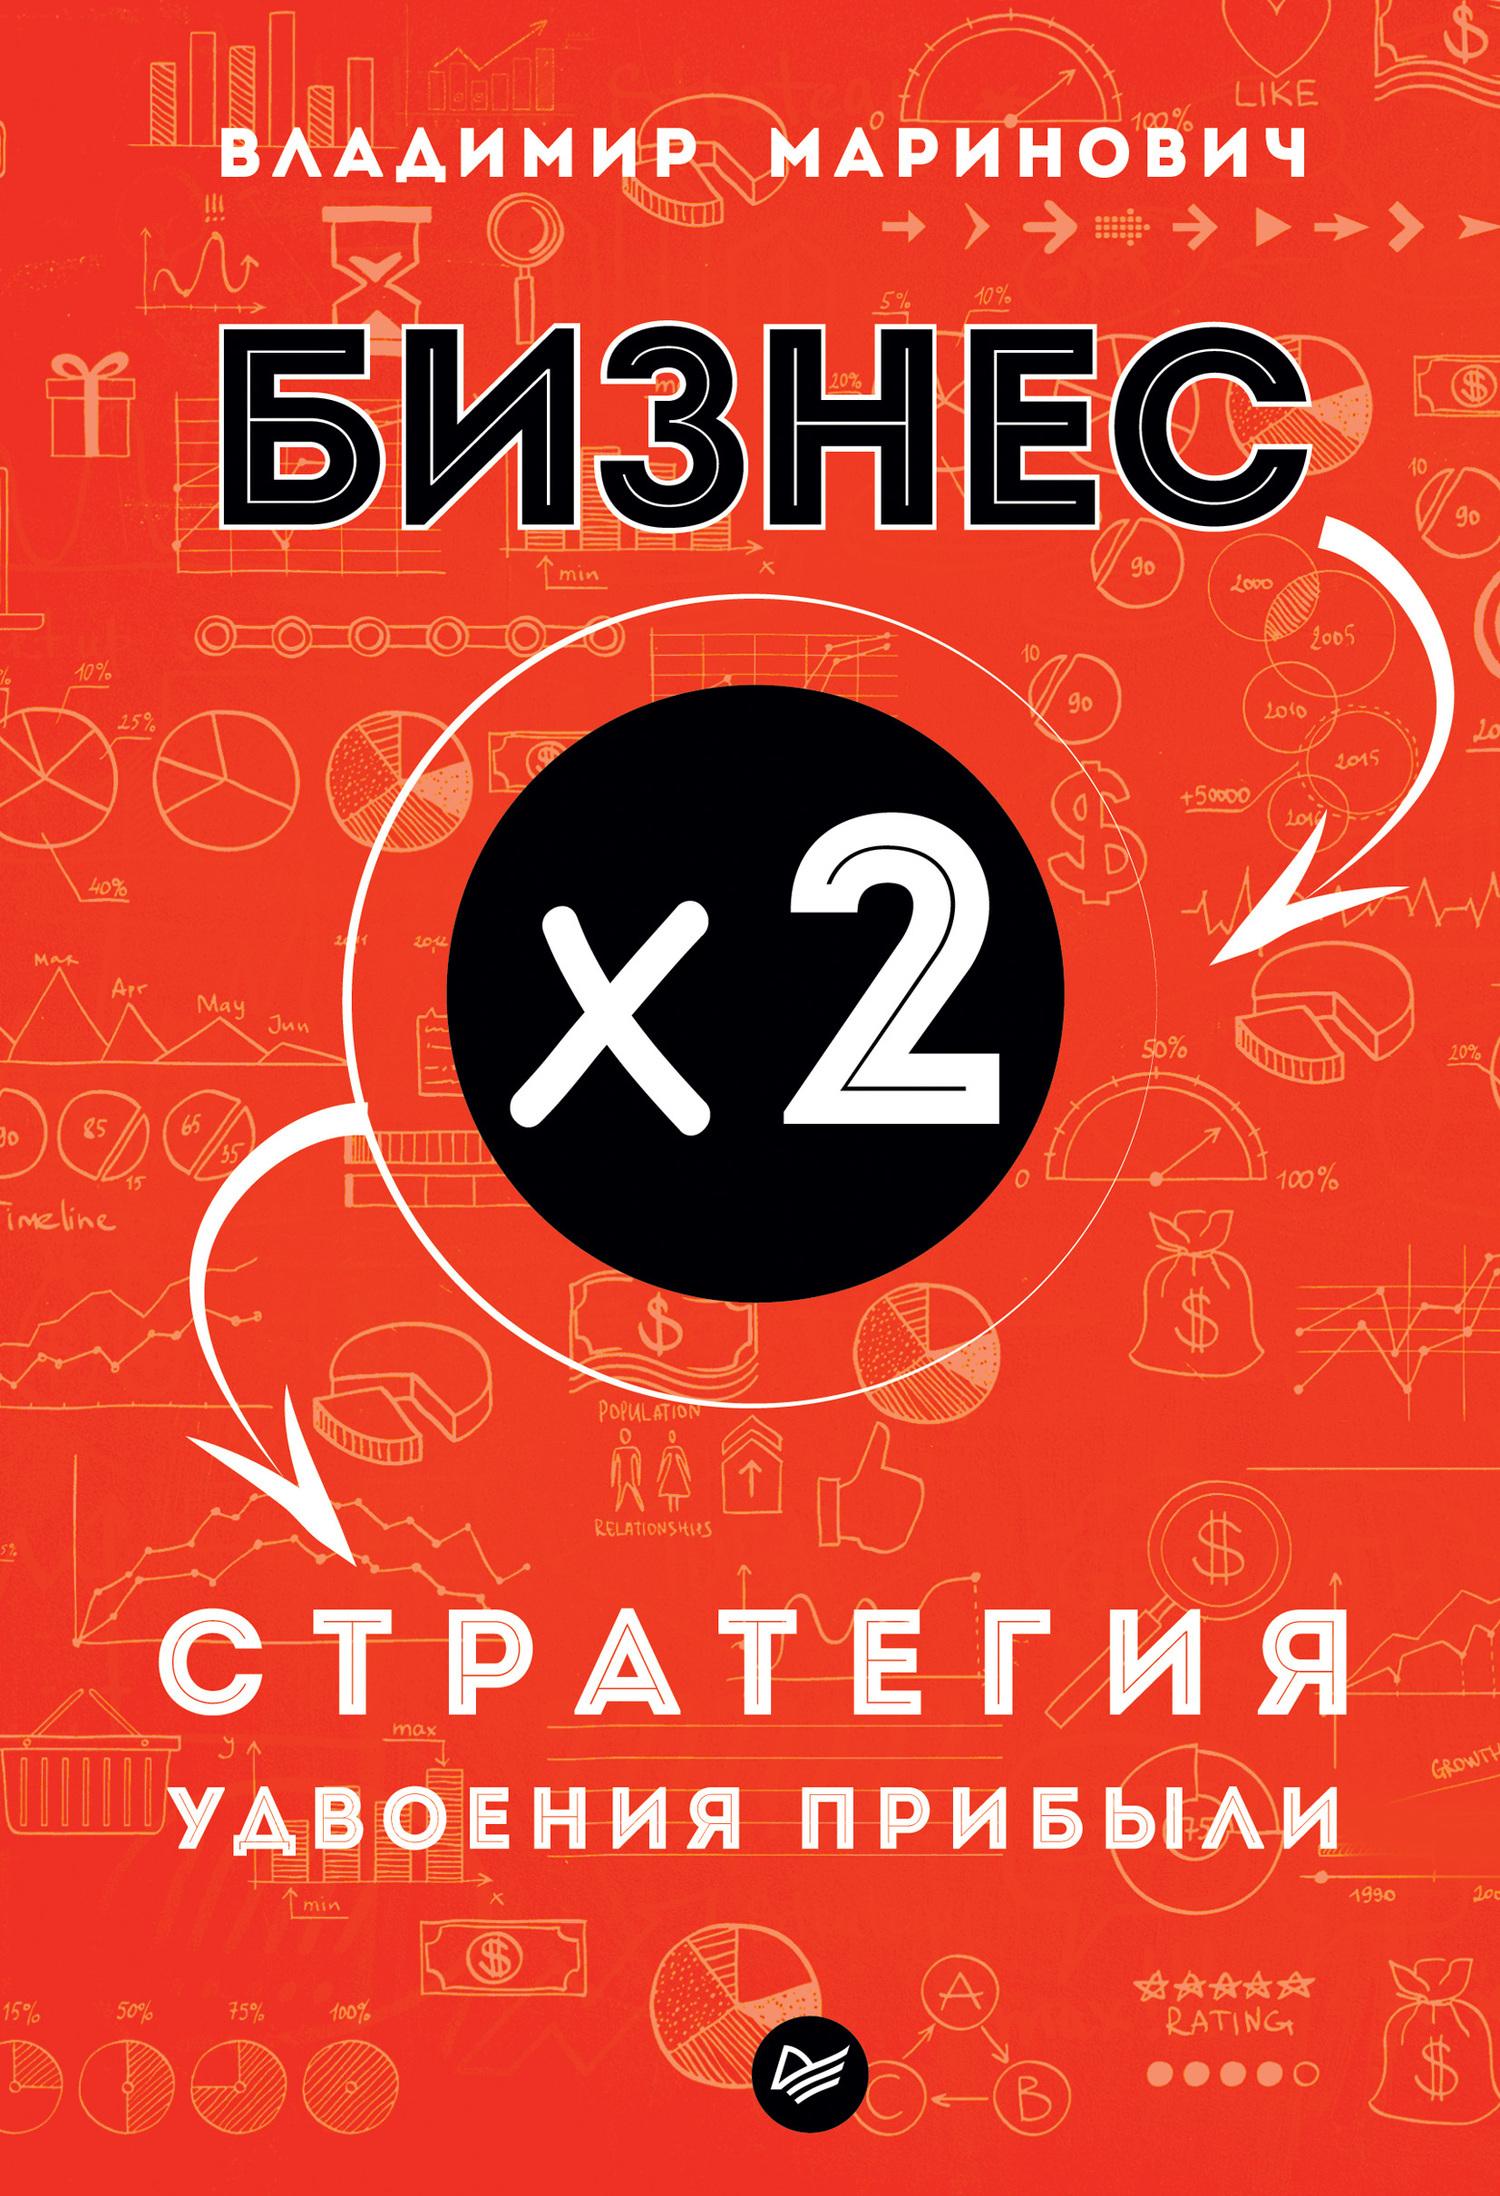 Обложка книги. Автор - Владимир Маринович